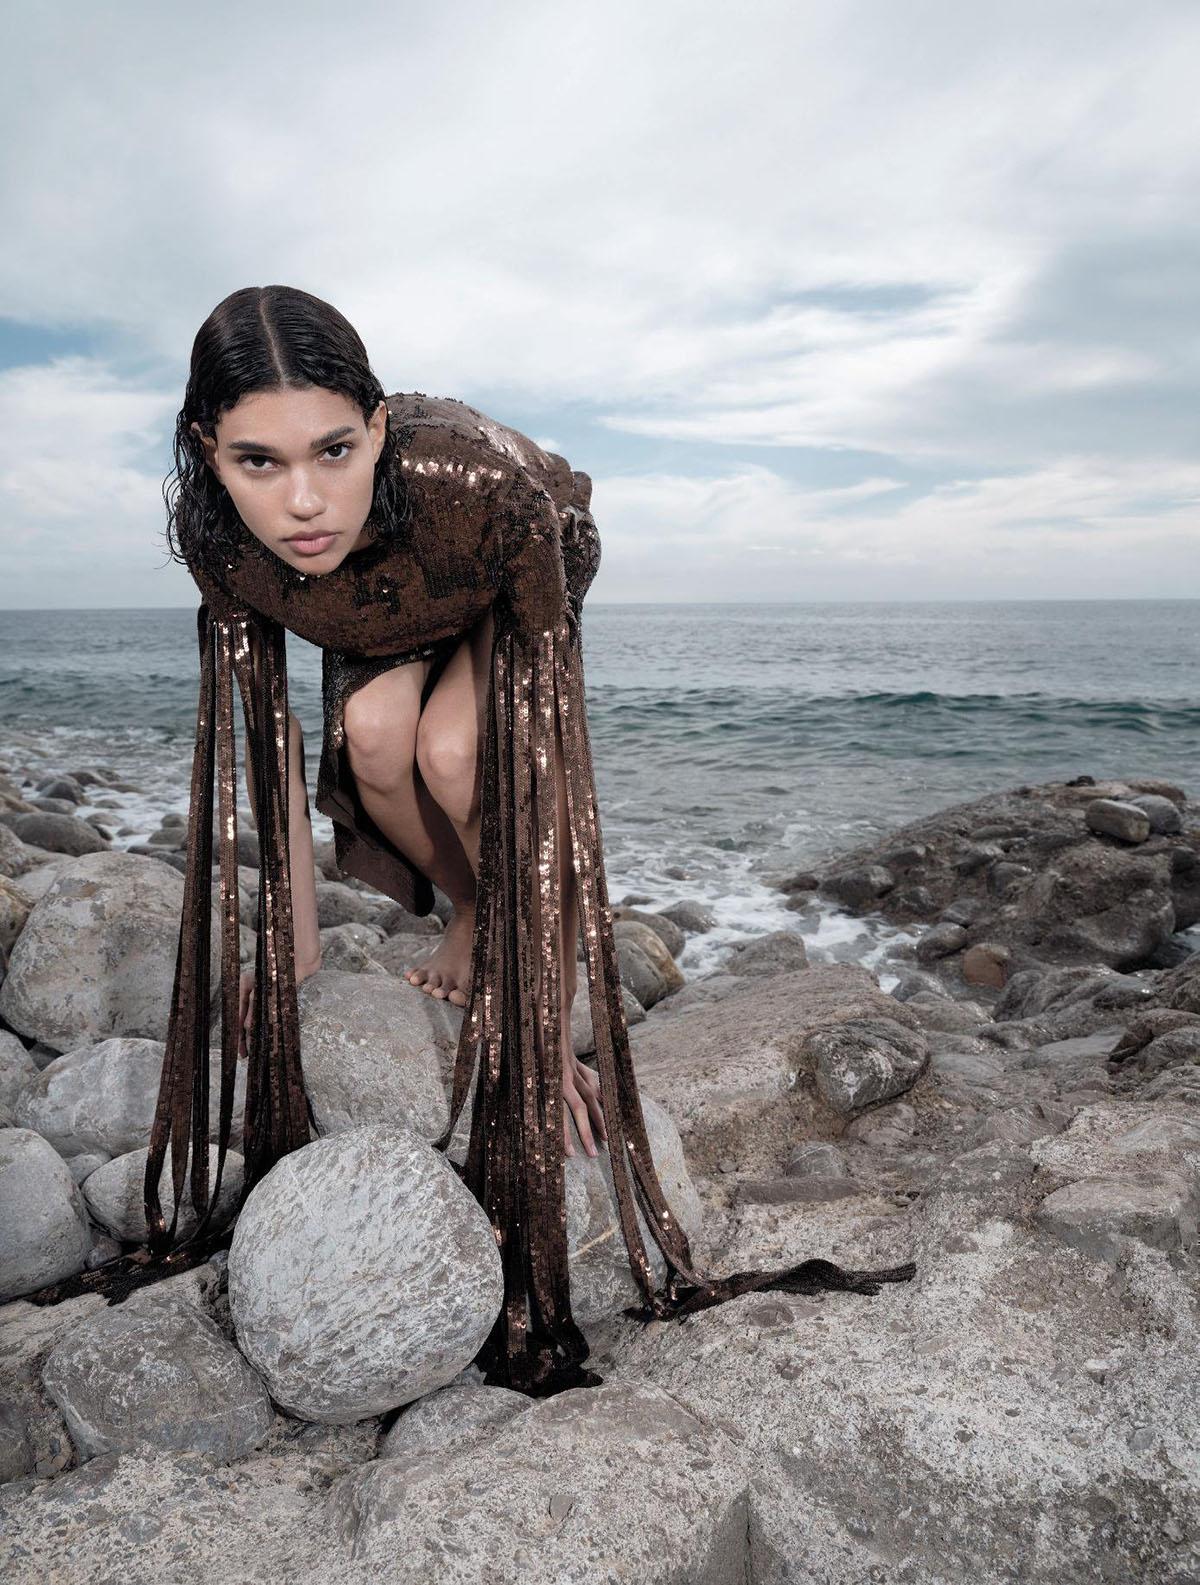 Barbara Valente by Mariya Pepelanova for Numéro June/July/August 2021